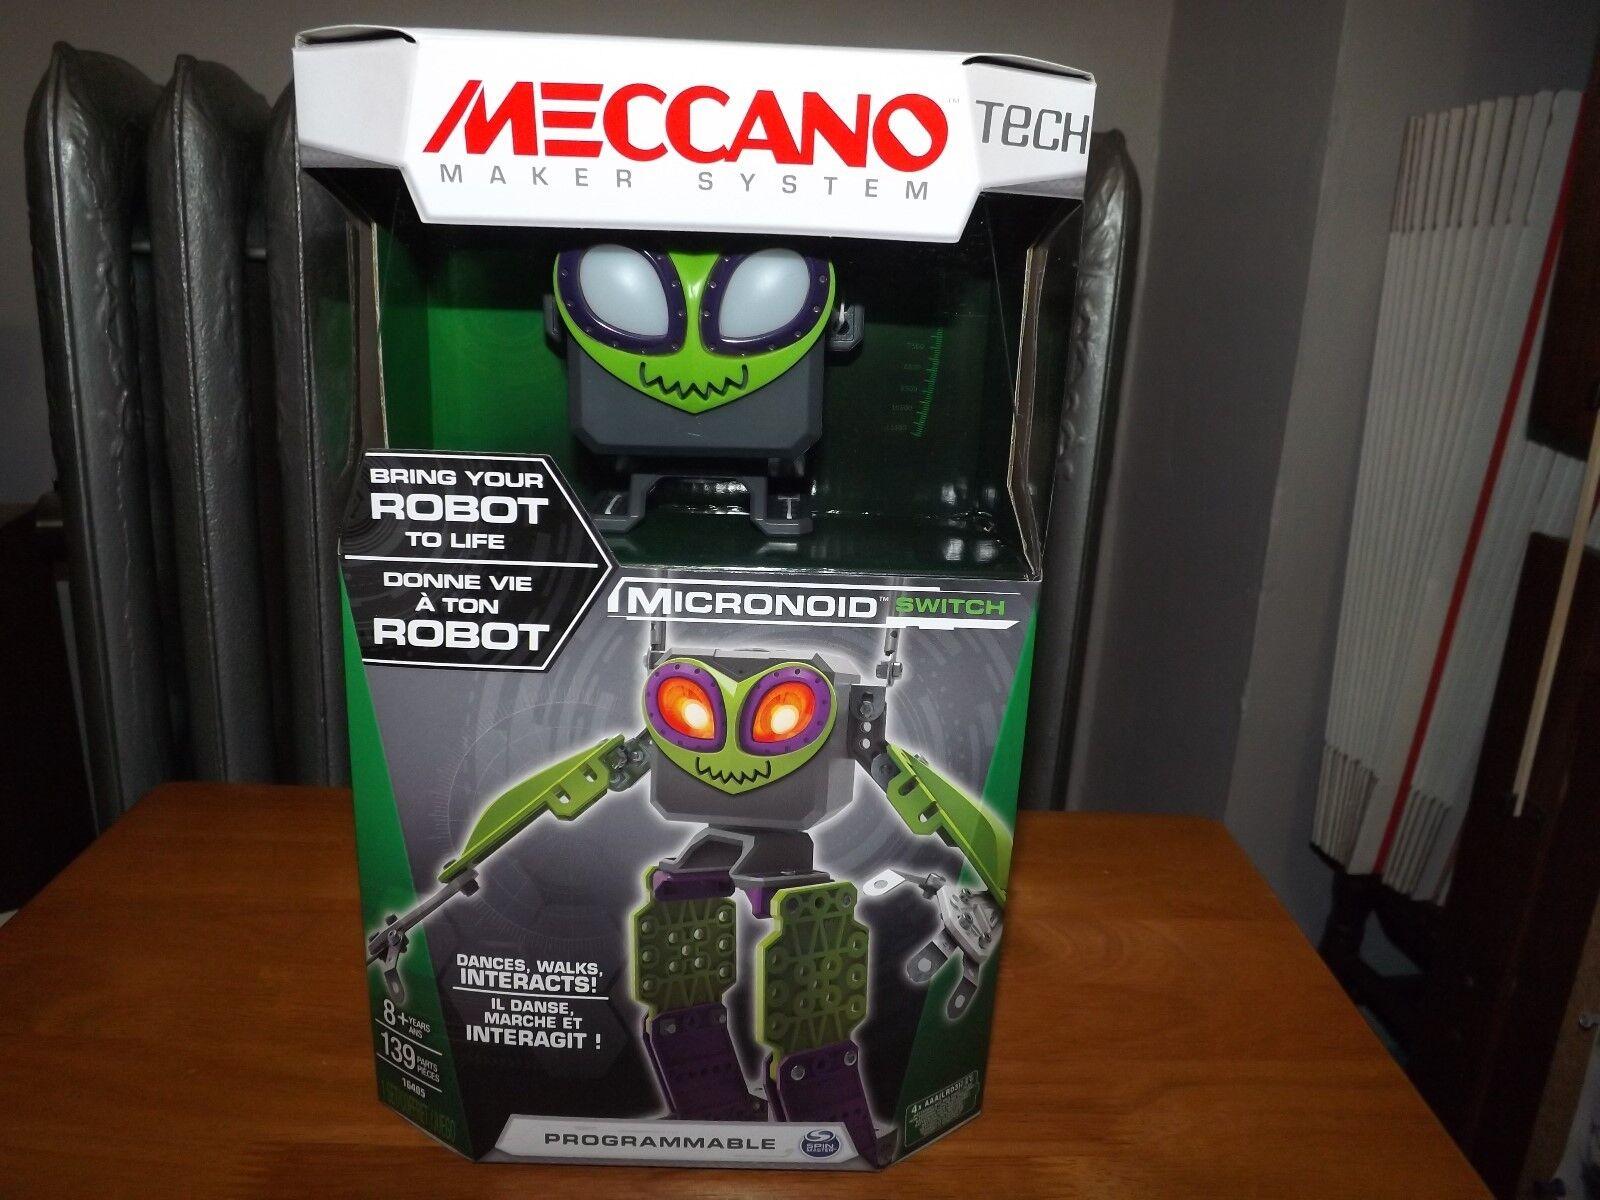 MECCANO MAKER SYSTEM TECH, MICRONOID SWITCH, ROBOT  16405, NIB, 2016